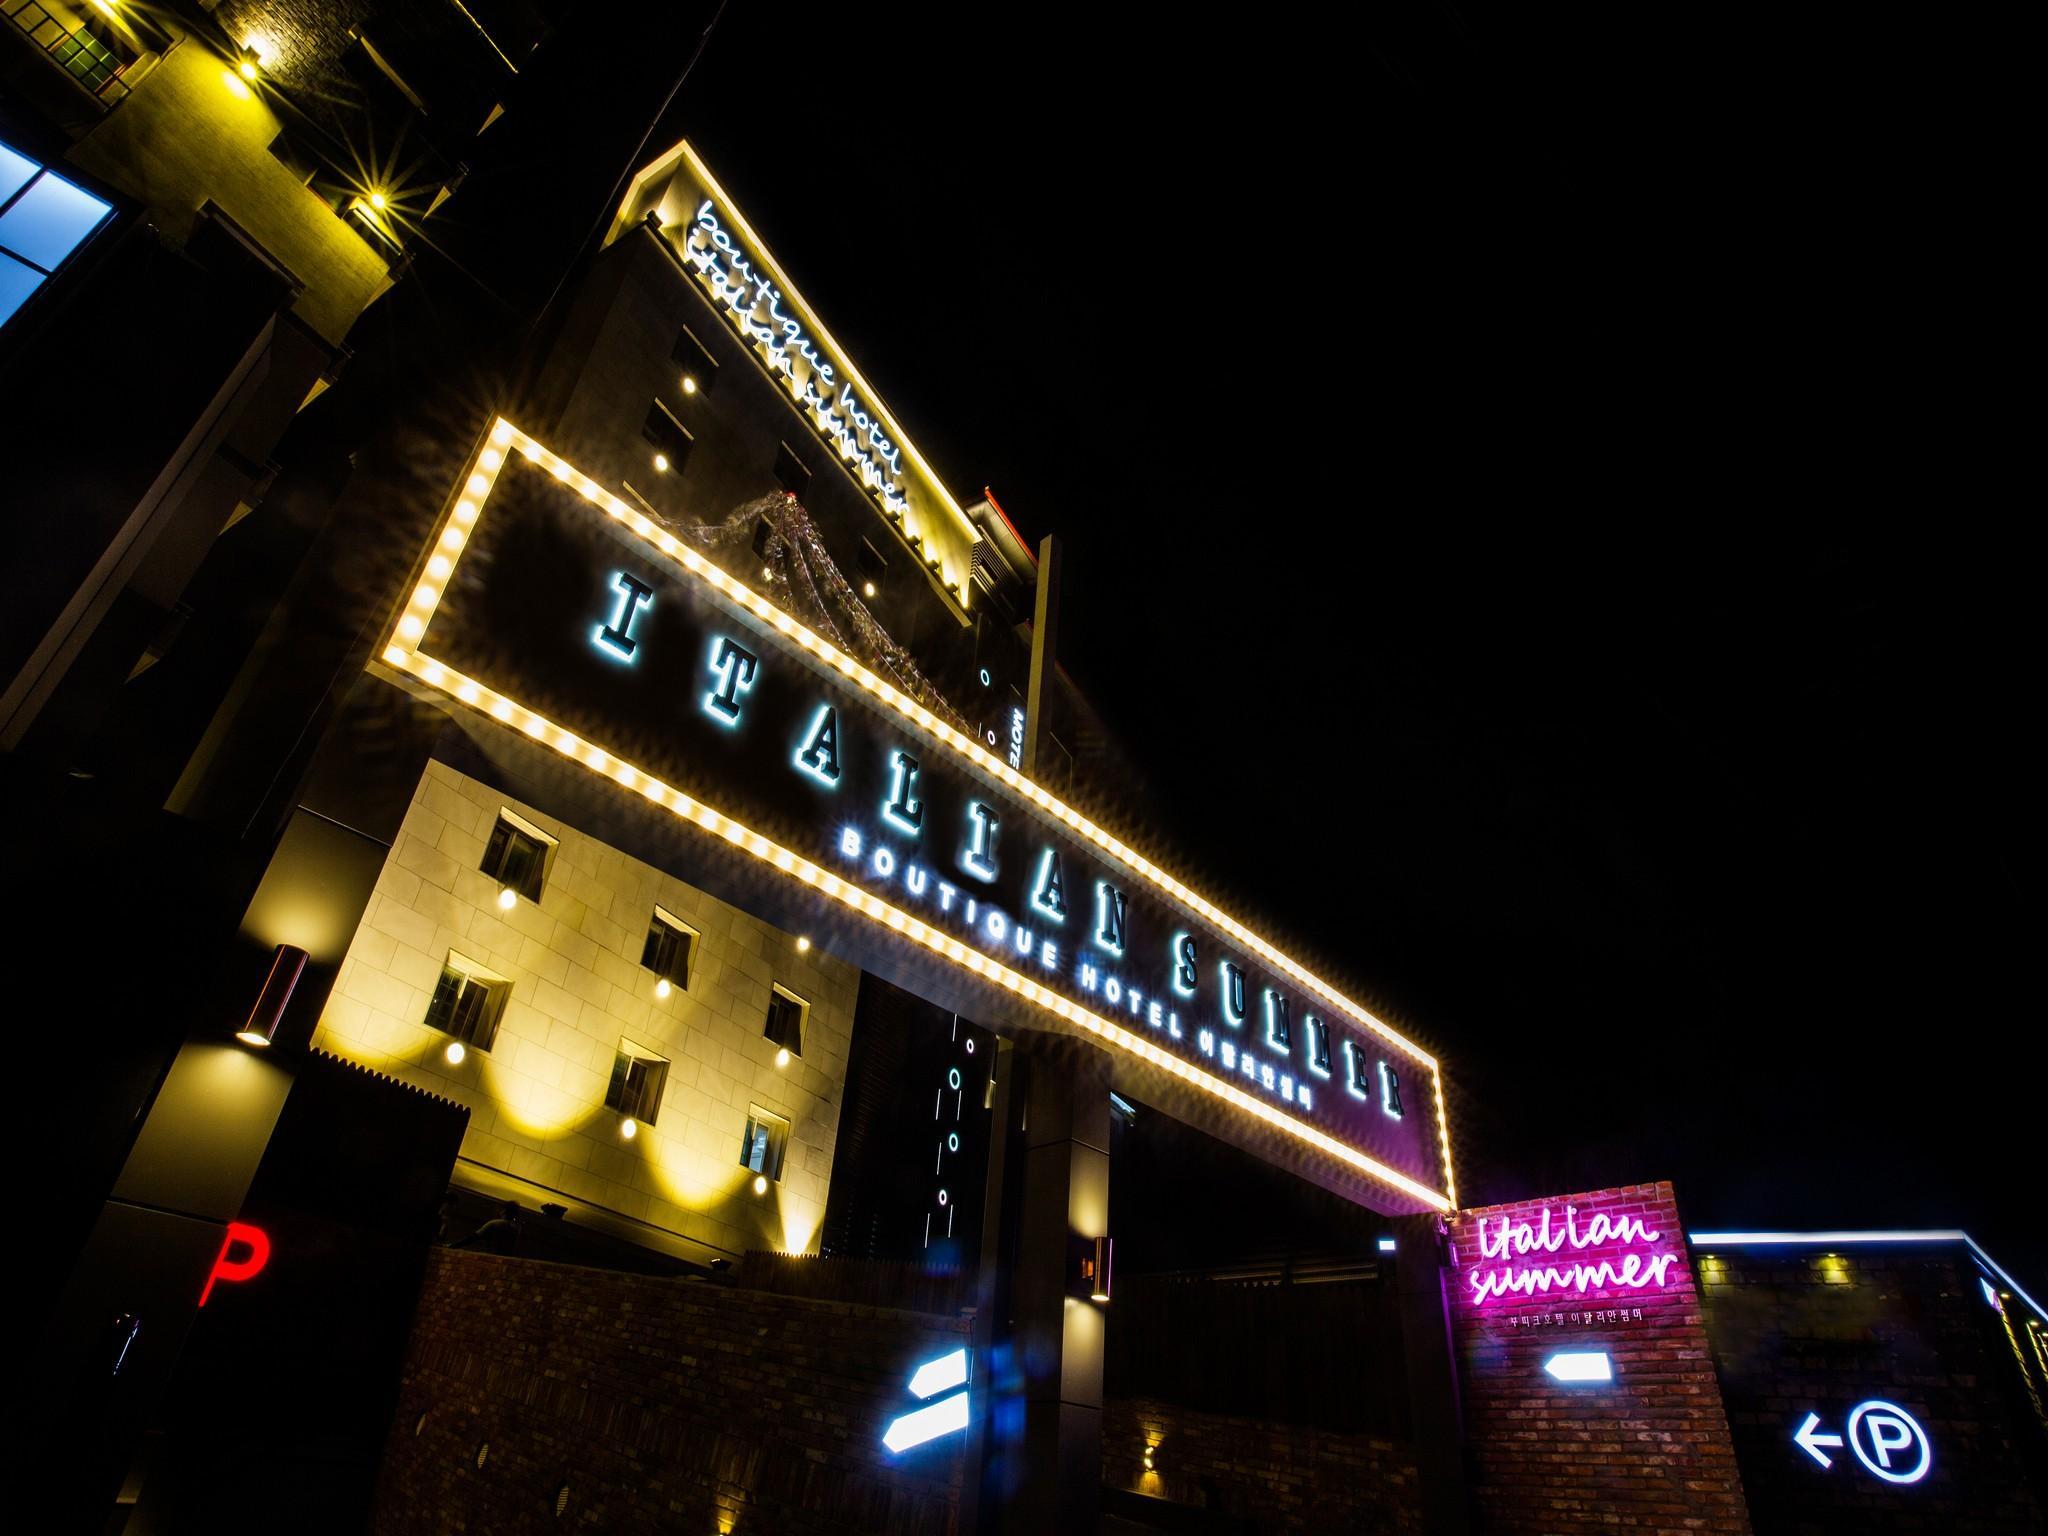 Italian Summer Boutique Hotel Songdo